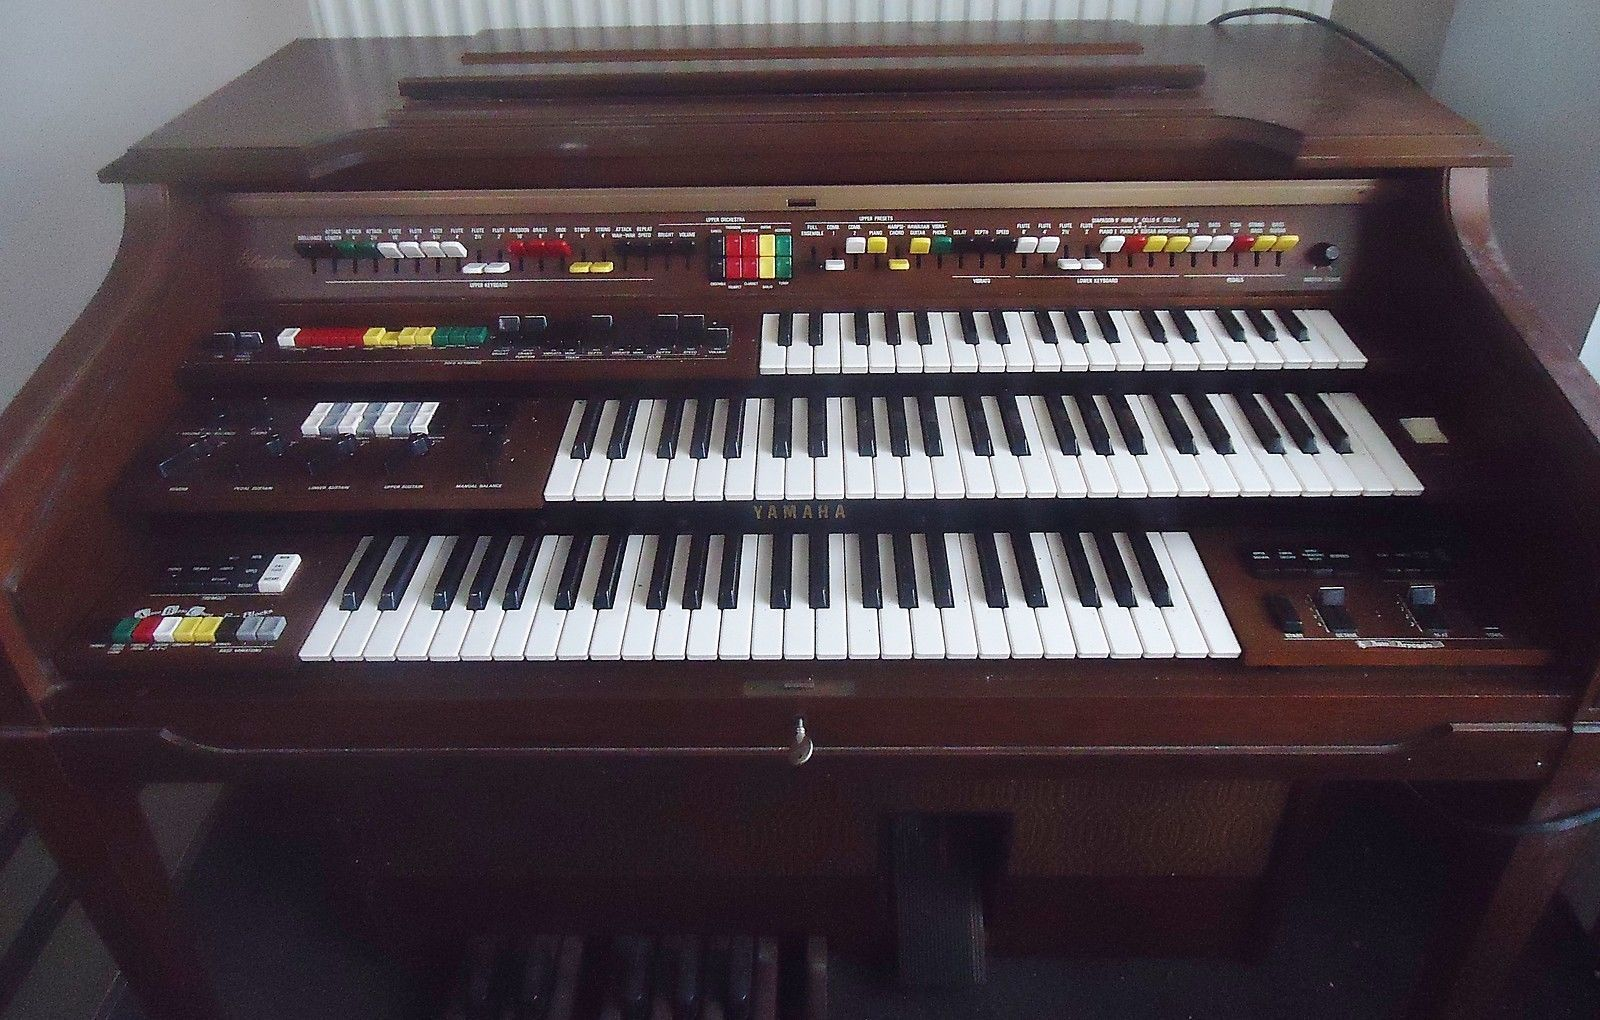 Yamaha electone heimorgel model d 80 ca 1977 http www for Yamaha electone organ models